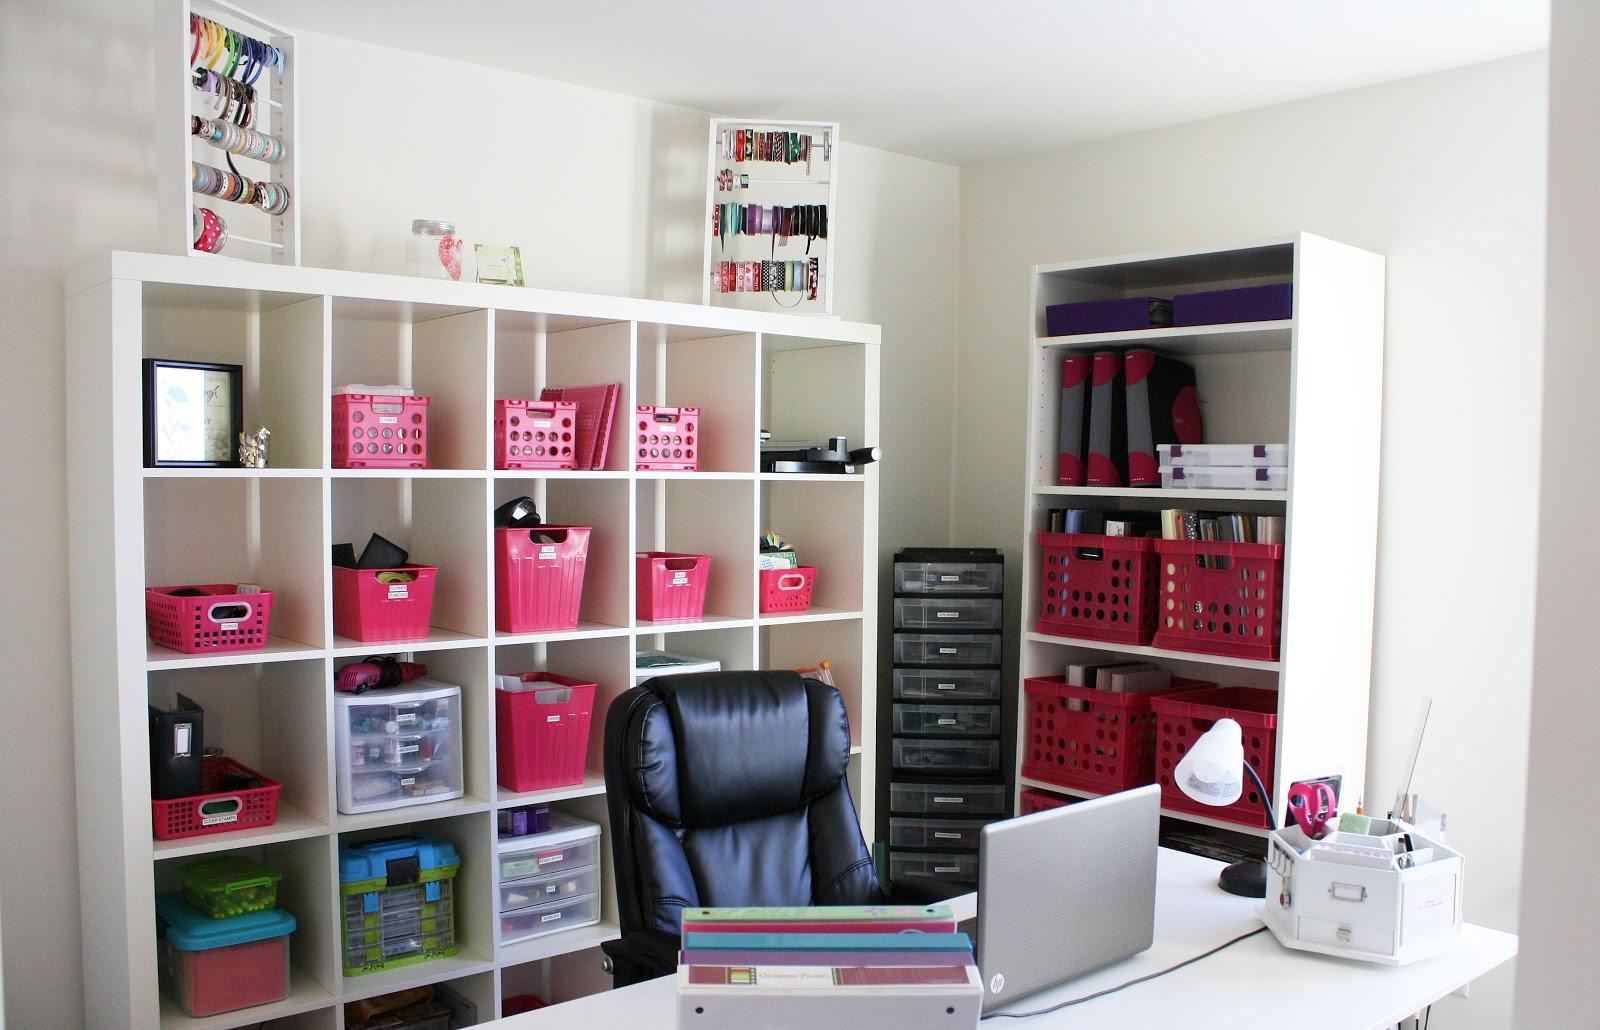 Reorganizing Room: Casual Fridays: Organizing My Scrap Room